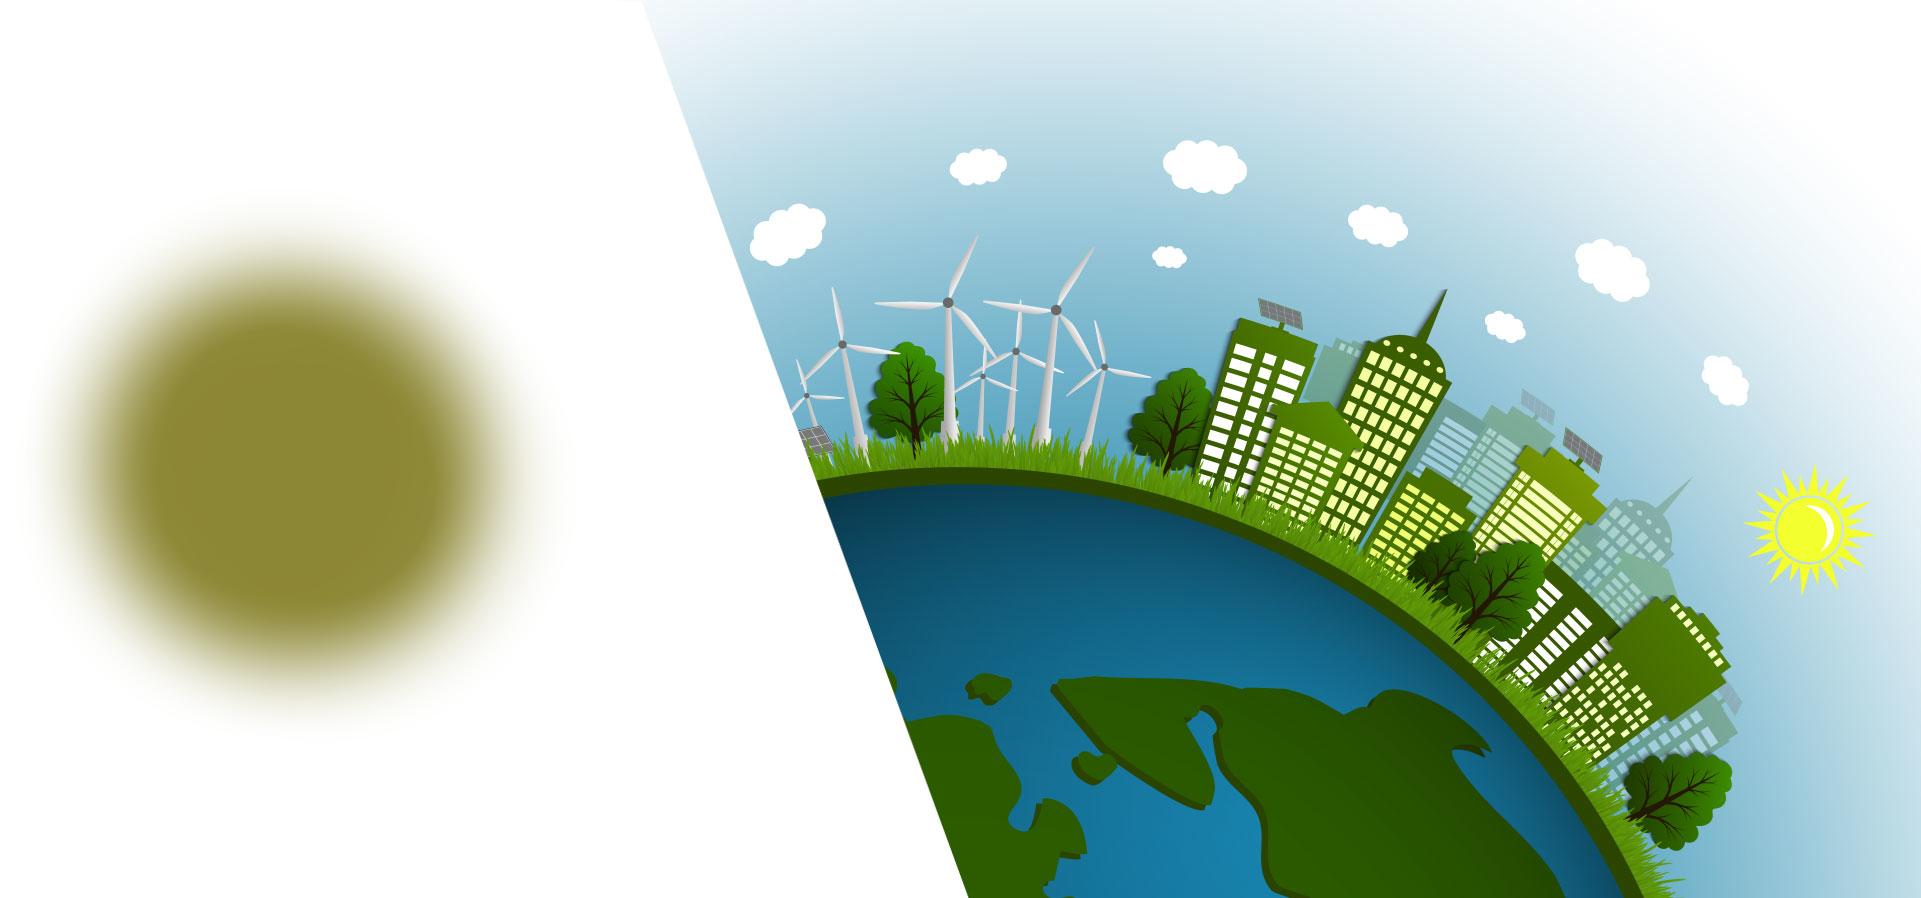 https://prasinotameio.gr/wp-content/uploads/2020/11/Green_planet-02.png